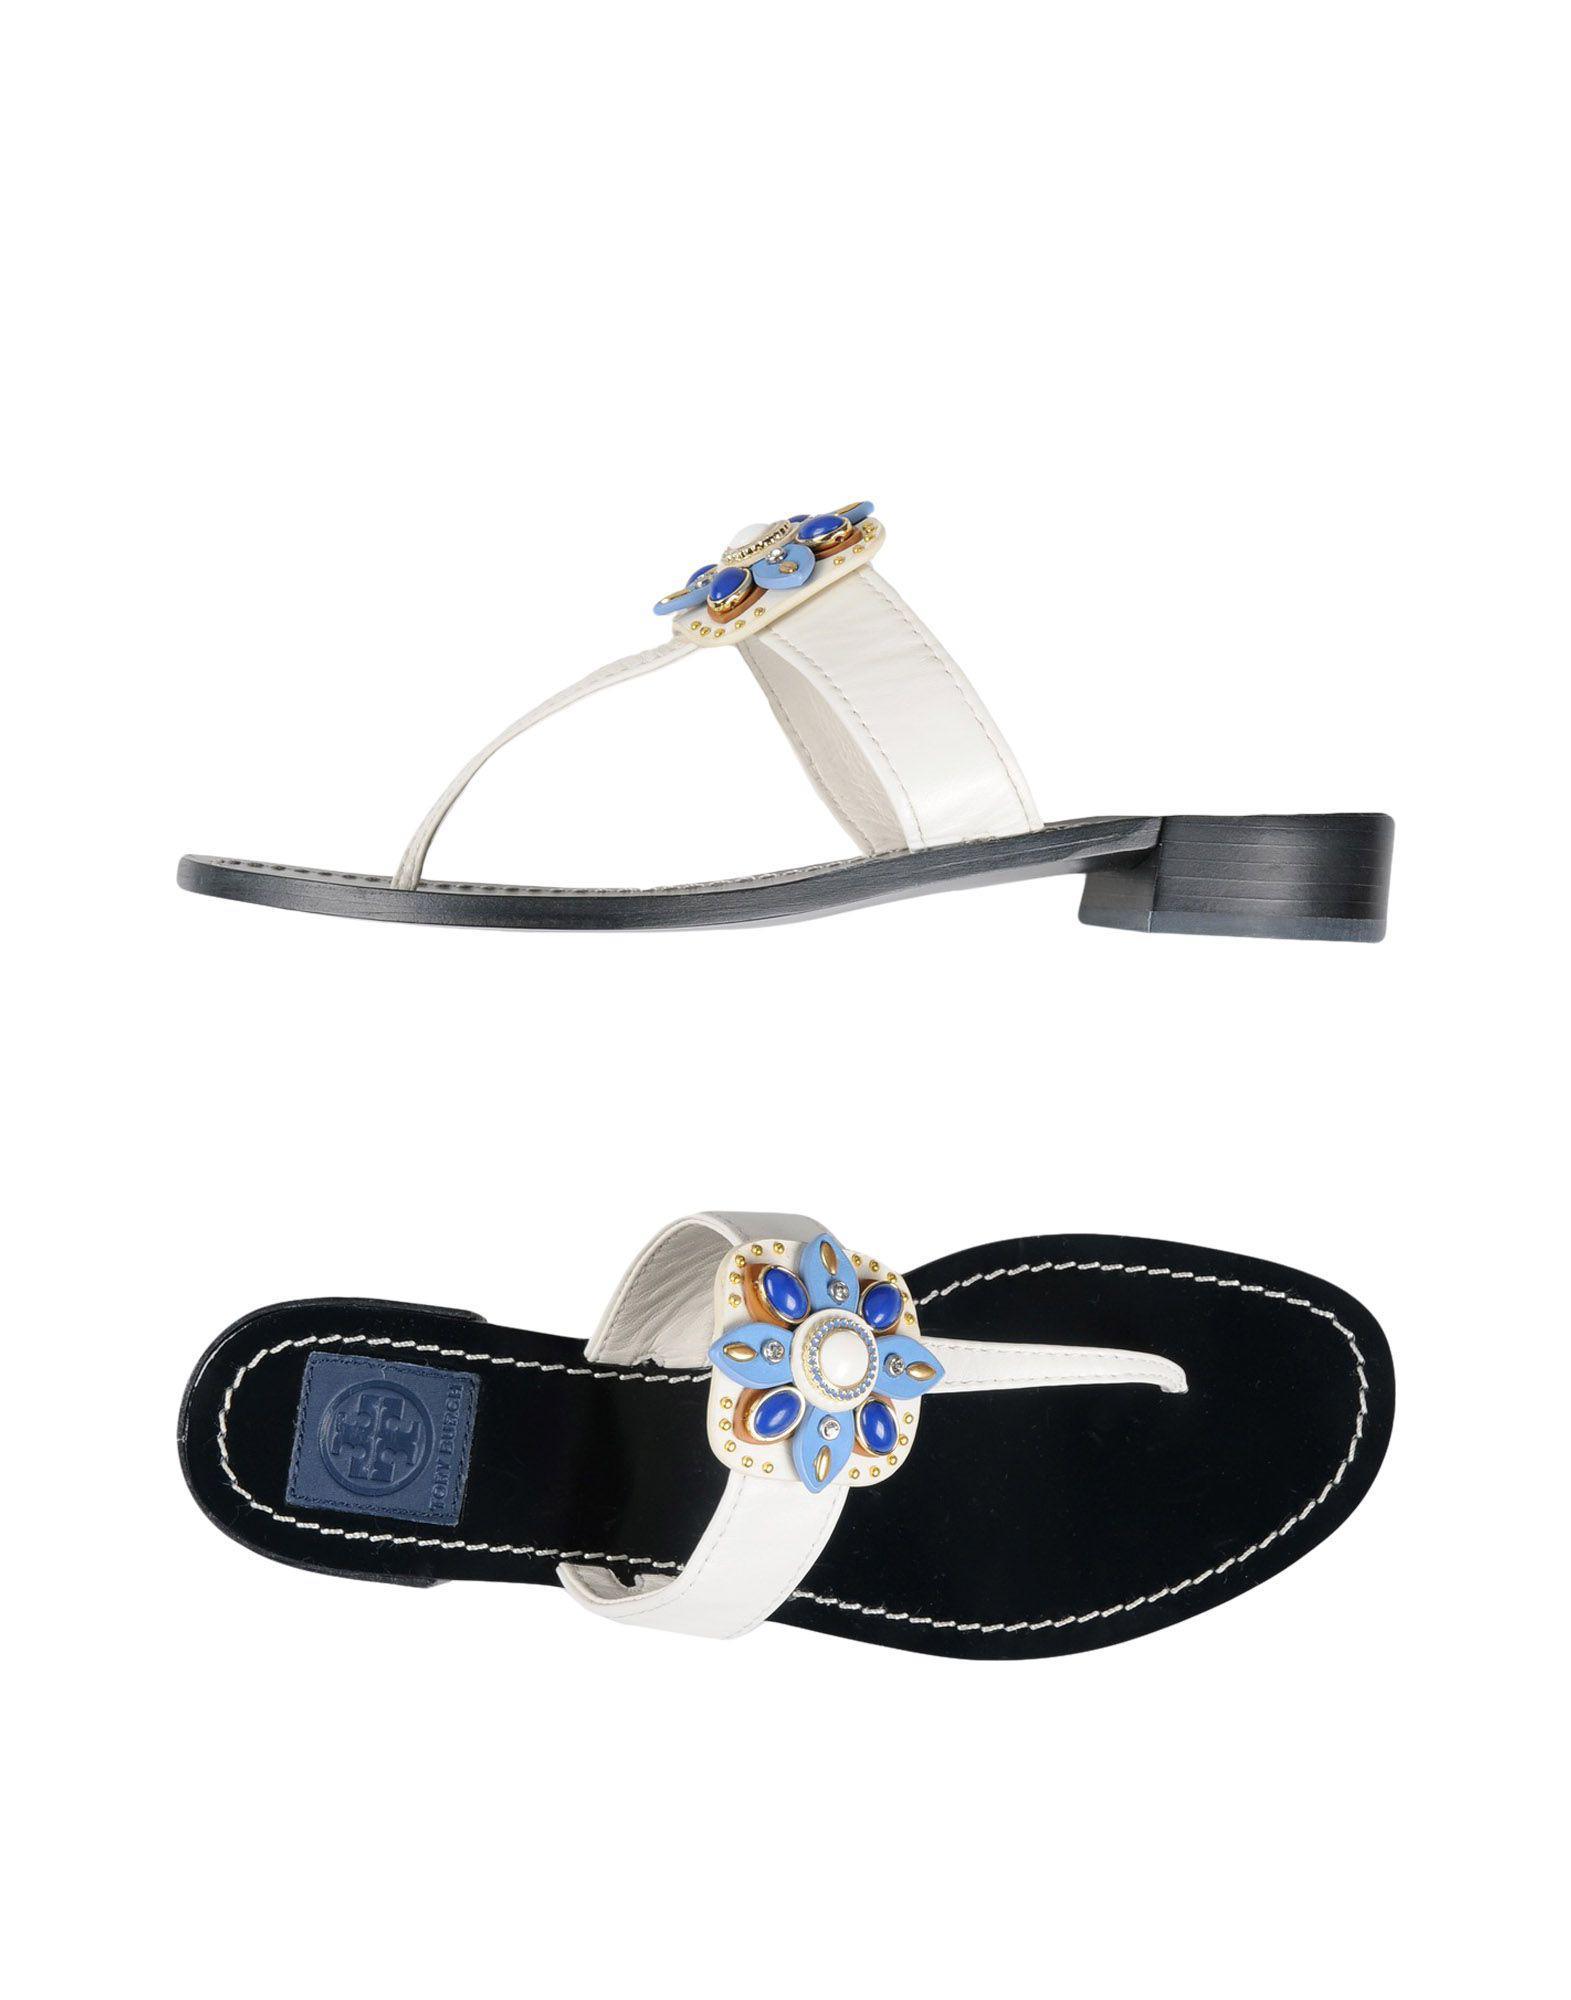 FOOTWEAR - Toe post sandals Tory Burch flatWObQO